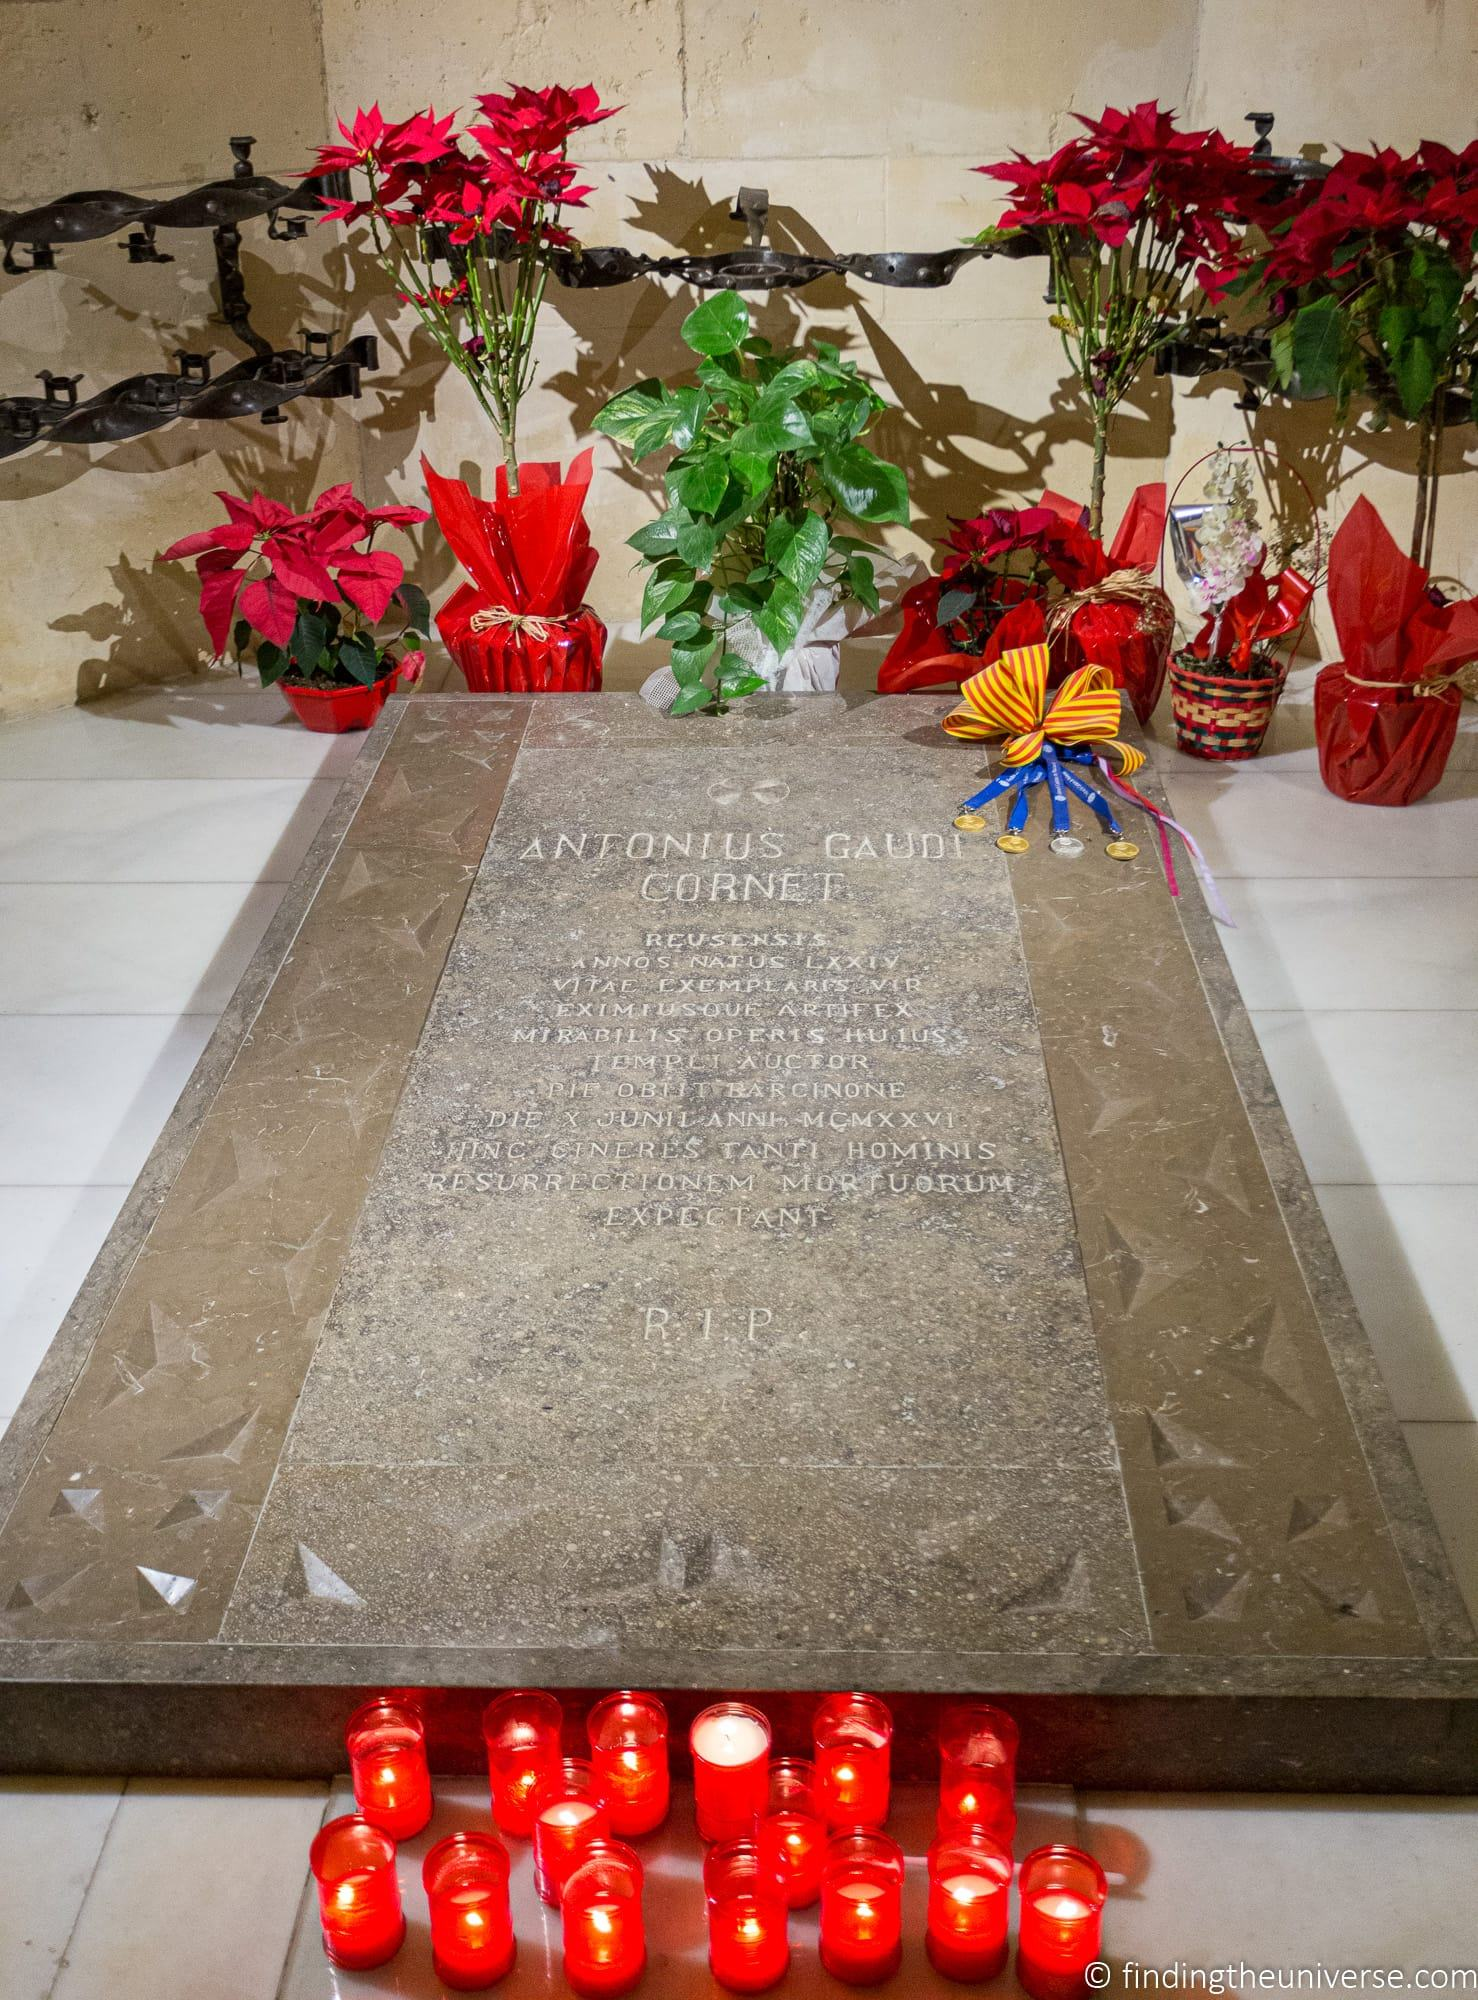 Sagrada Familia tomb of Antoni Gaudi